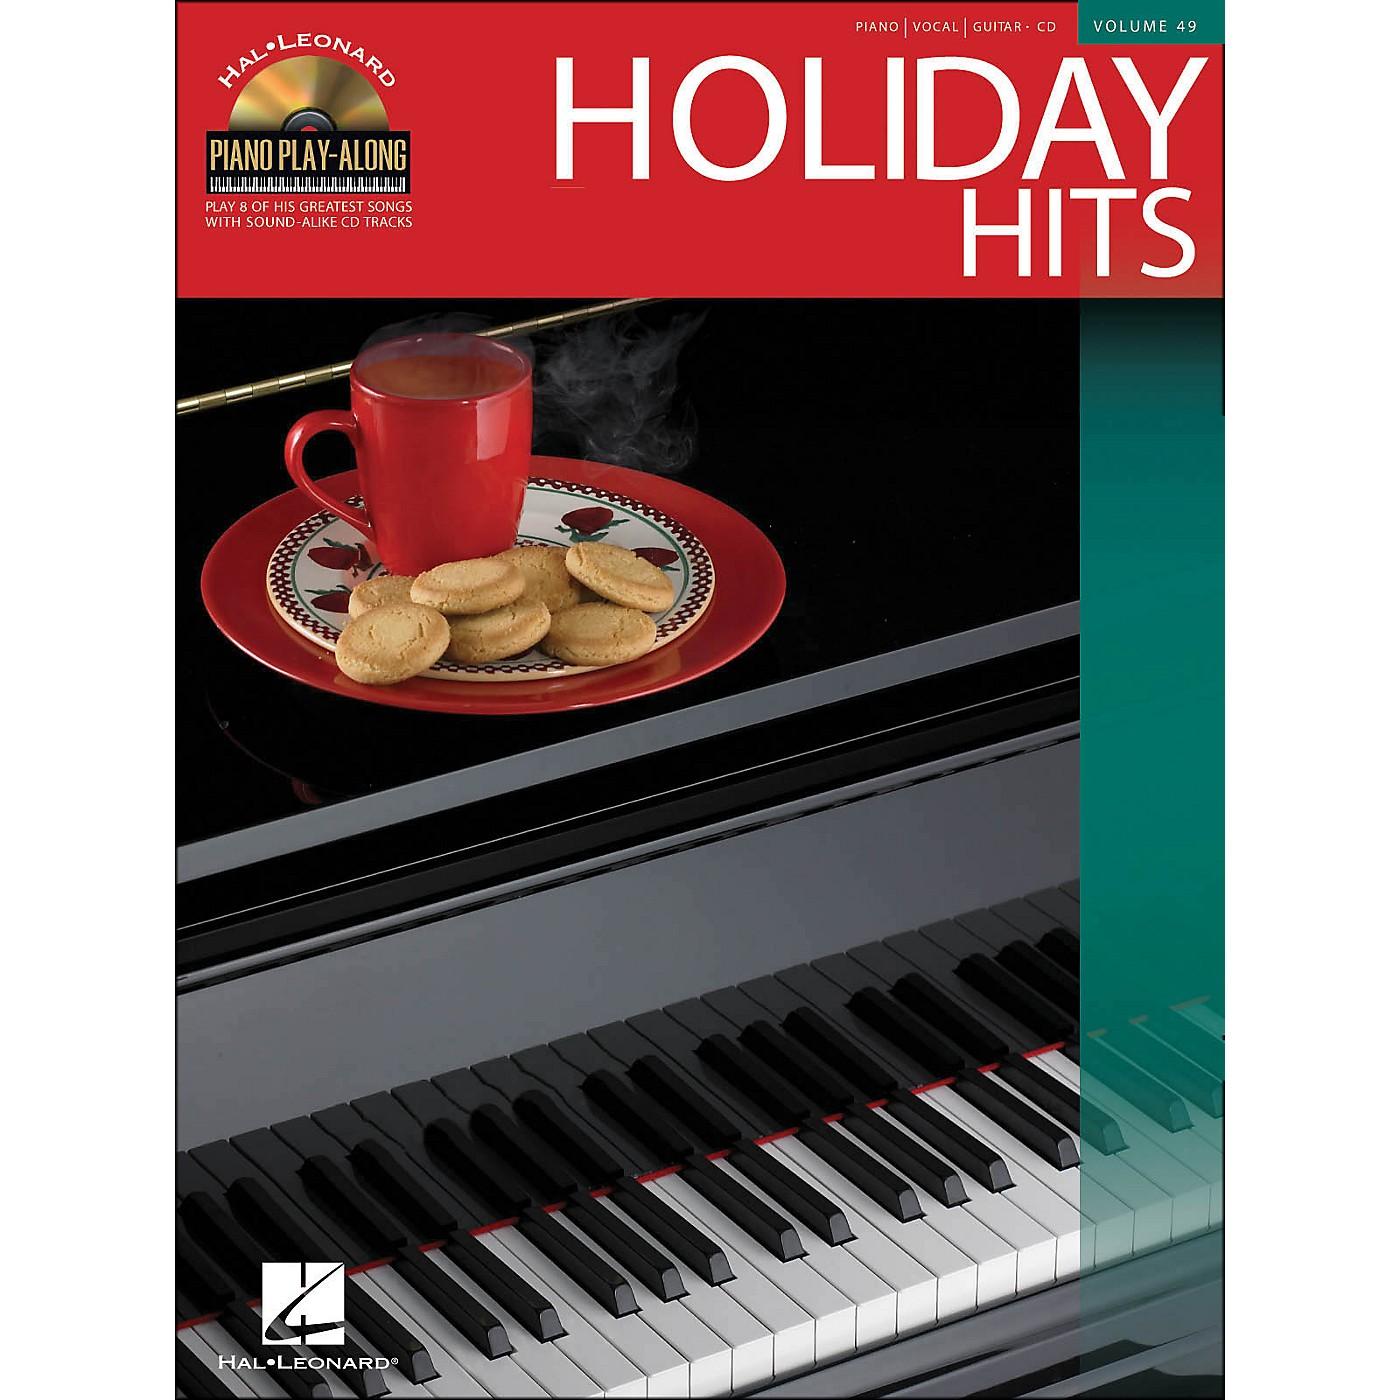 Hal Leonard Holiday Hits Volume 49 Book/CD Piano Play-Along arranged for piano, vocal, and guitar (P/V/G) thumbnail